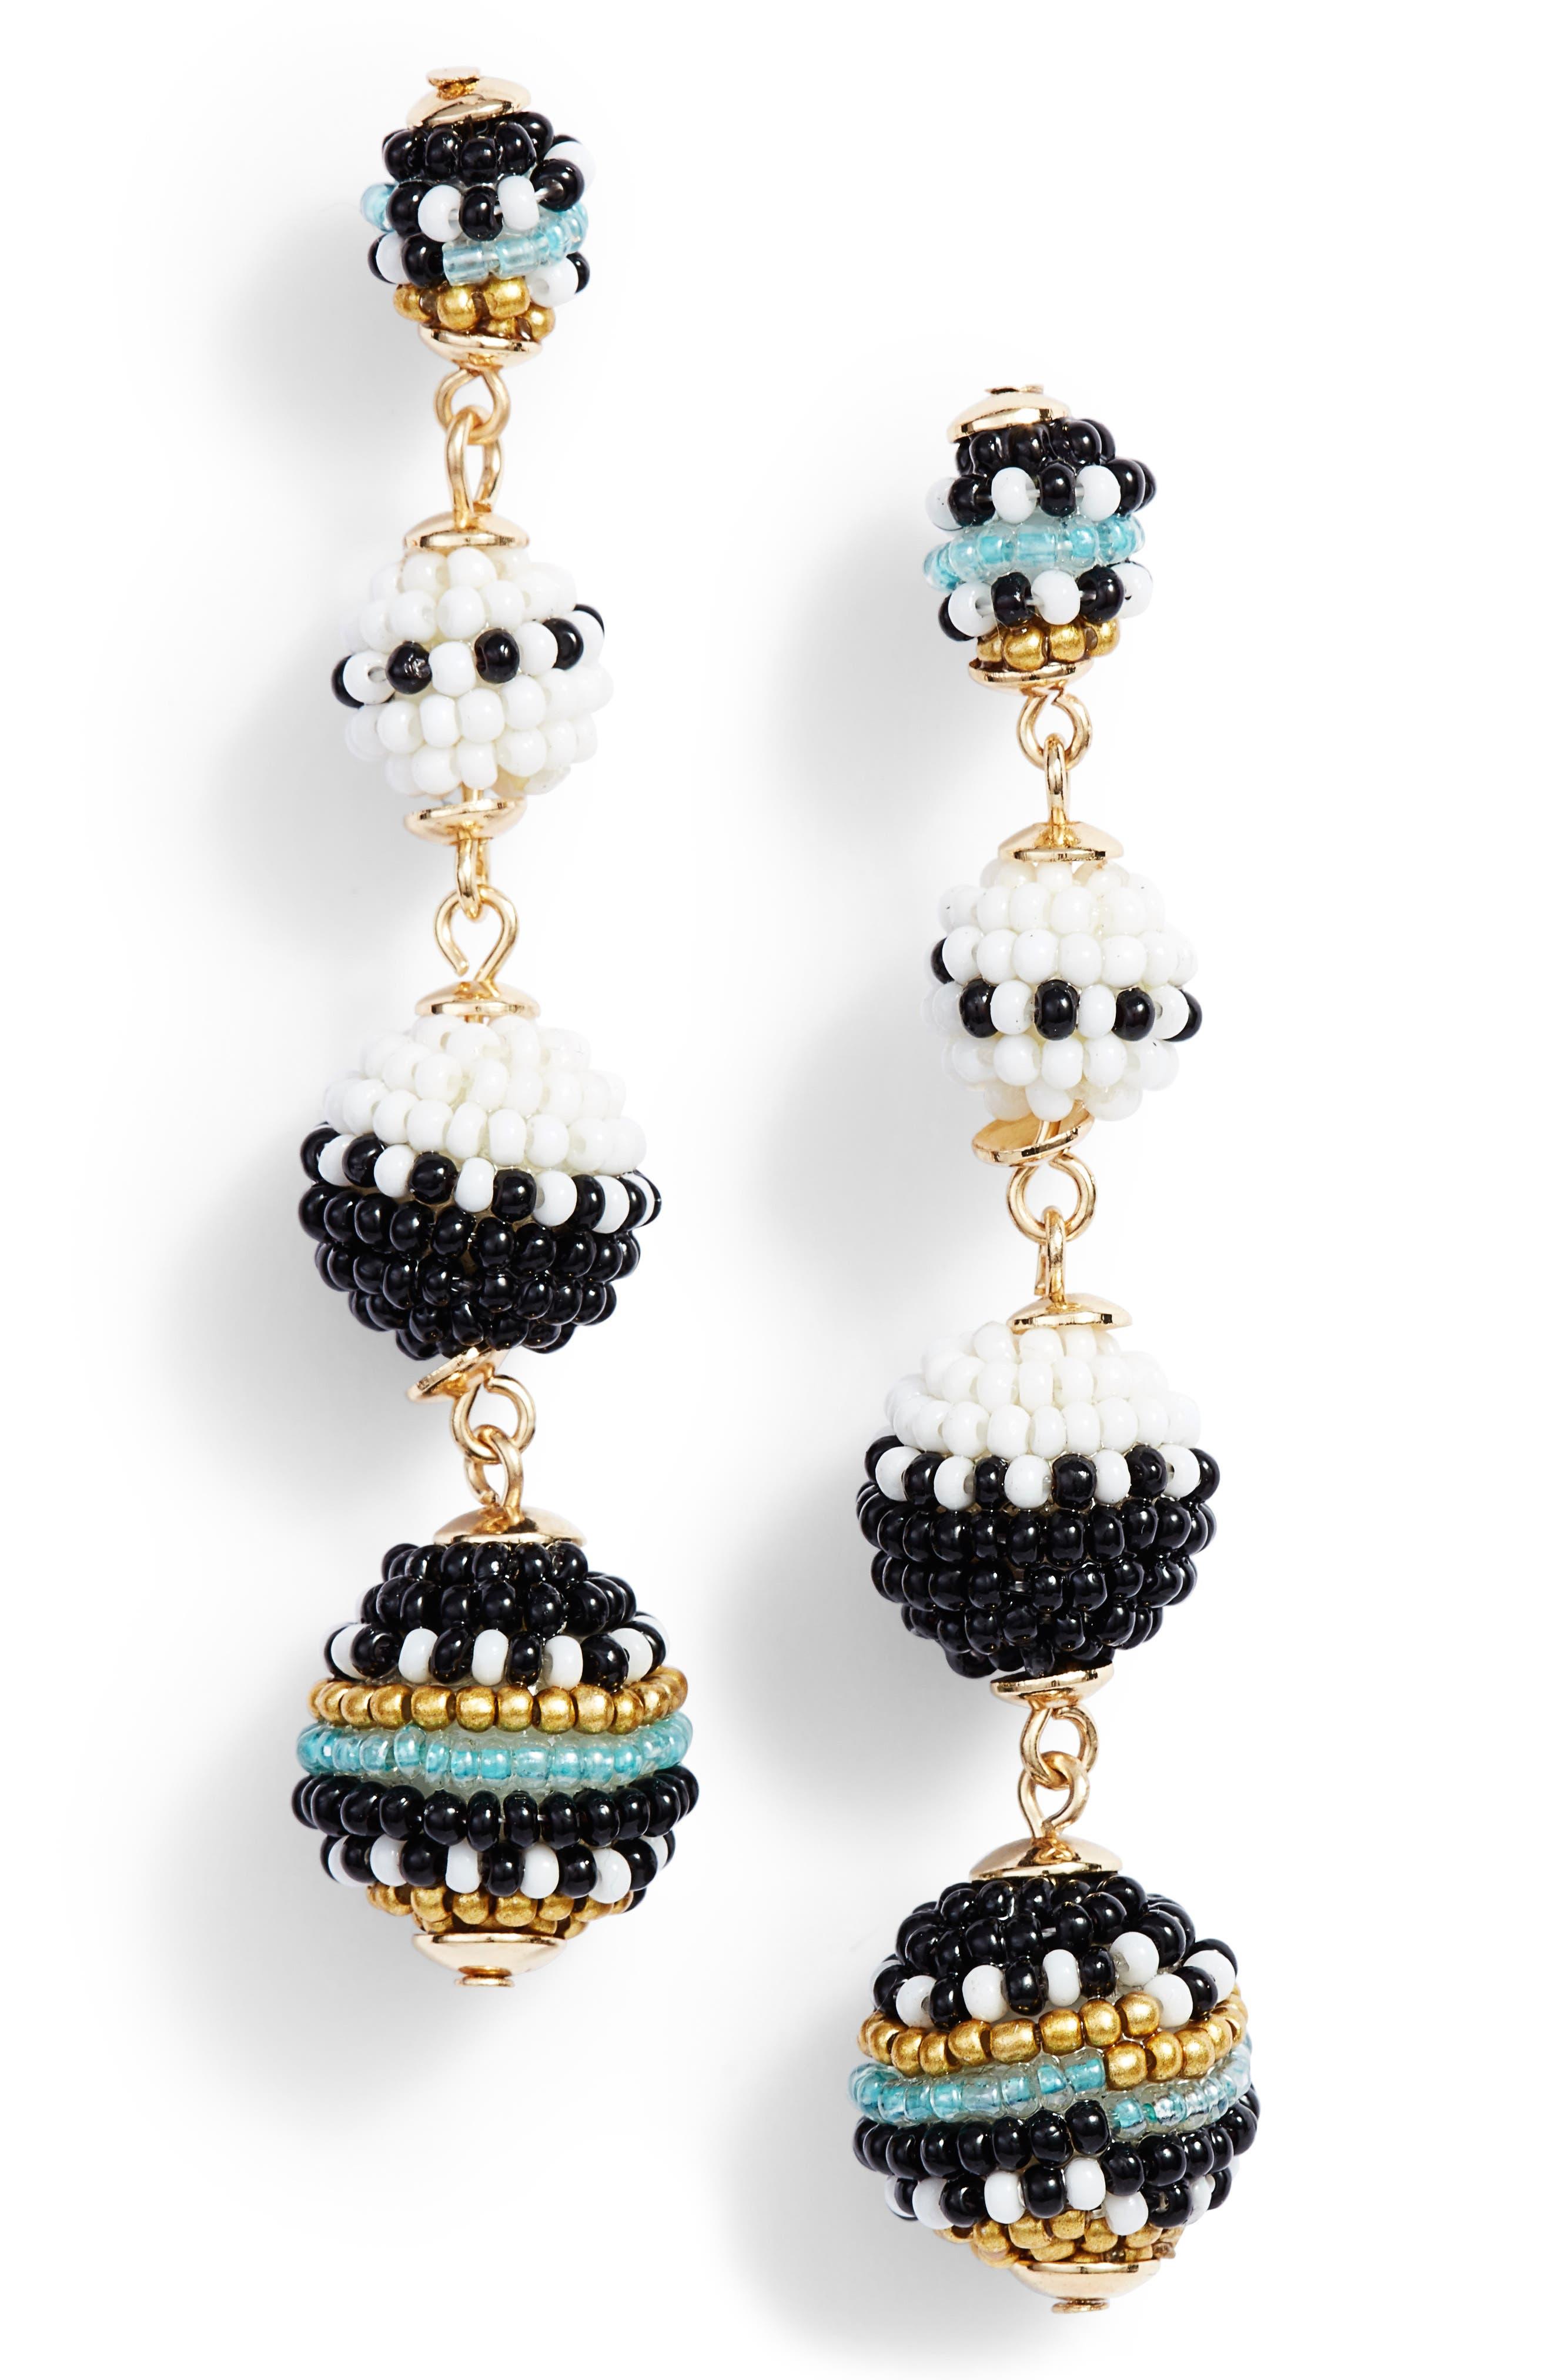 Blair Beaded Ball Drop Earrings,                             Main thumbnail 1, color,                             Black/ White Multi